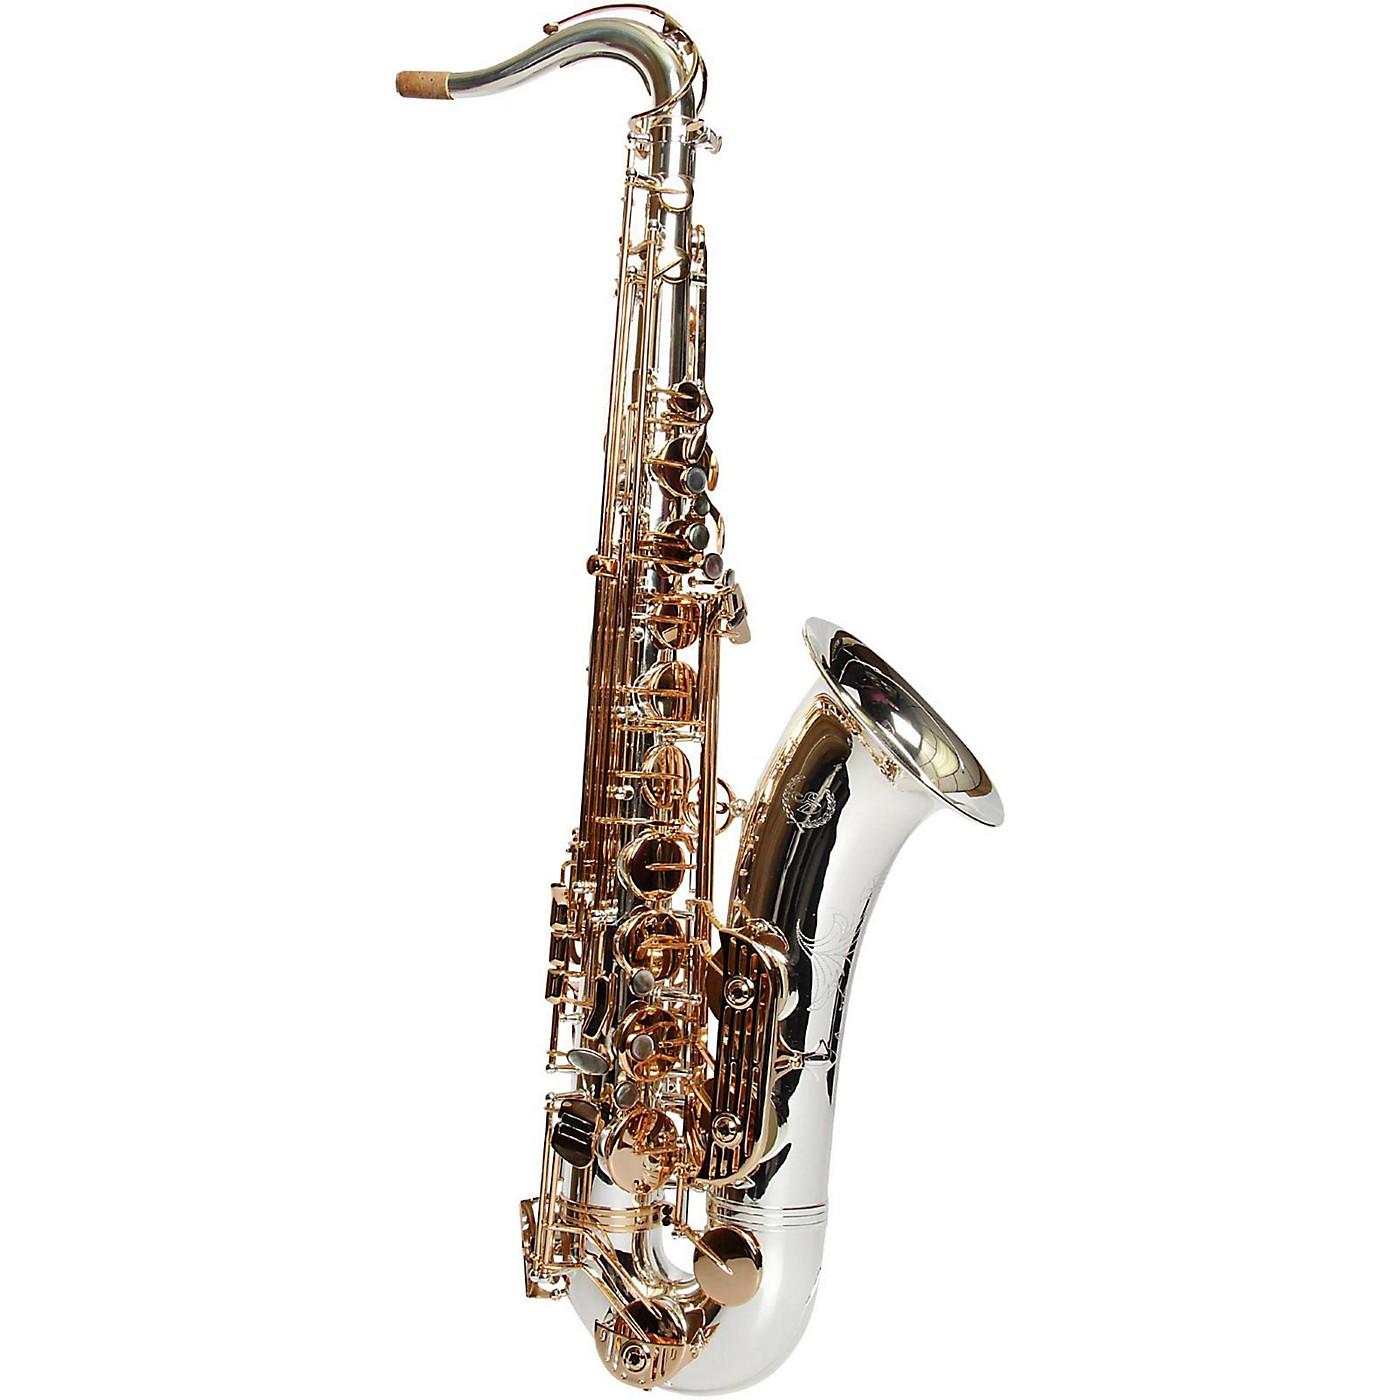 Sax Dakota SDA-XL-230 SP Professional Tenor Saxophone Gold Plated Keys and Trim thumbnail